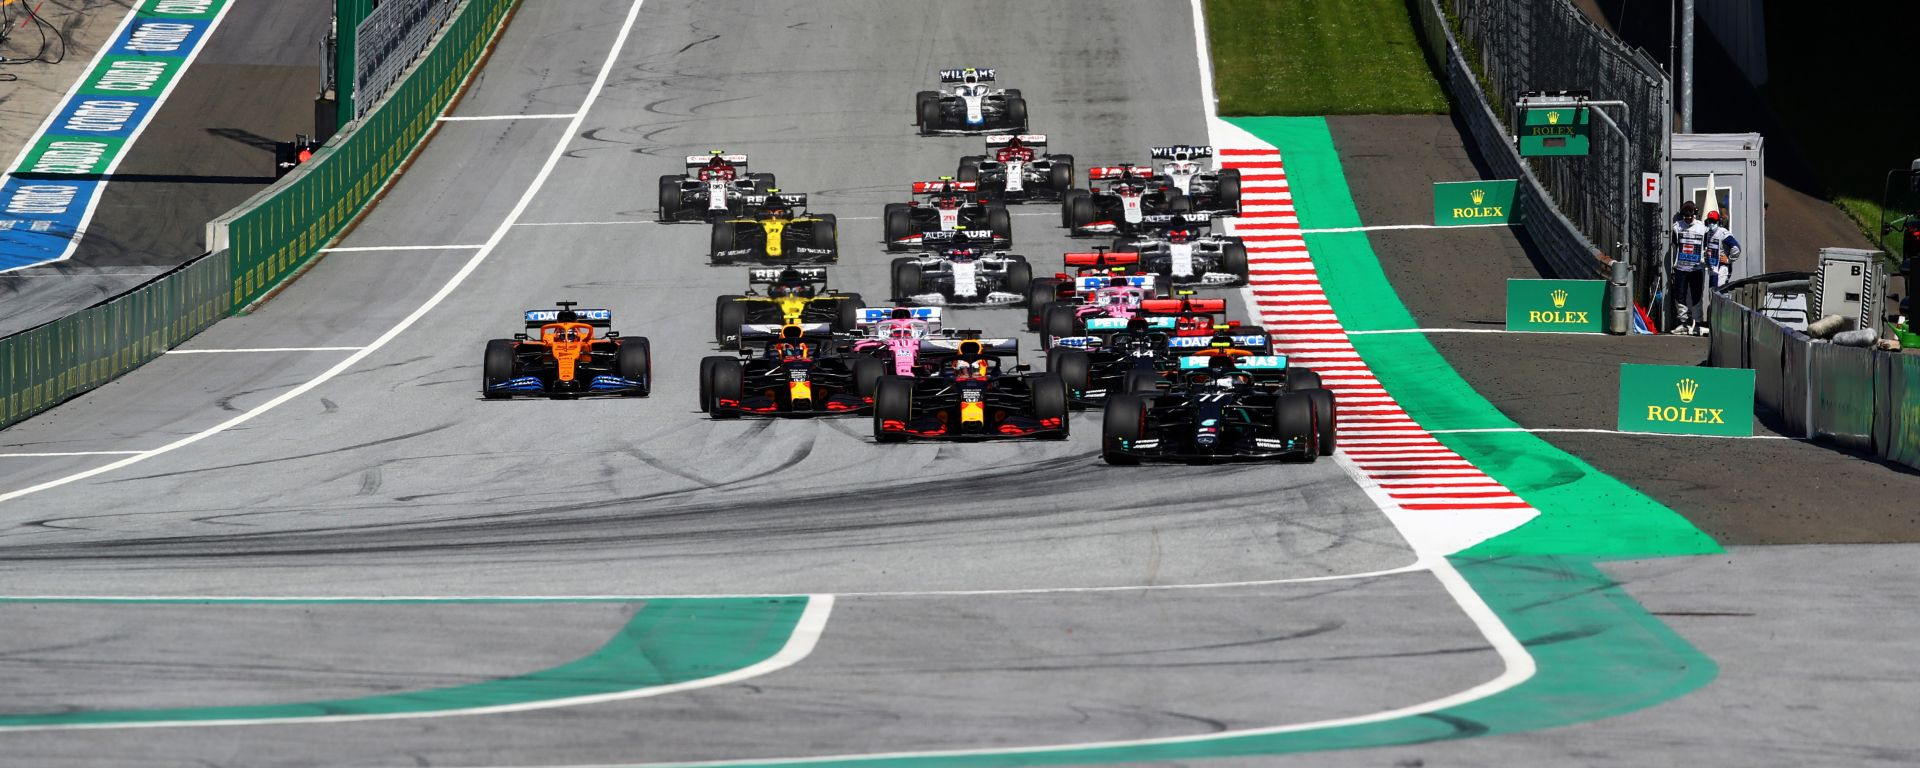 F1 GP Austria 2020, Spielberg: la partenza della gara